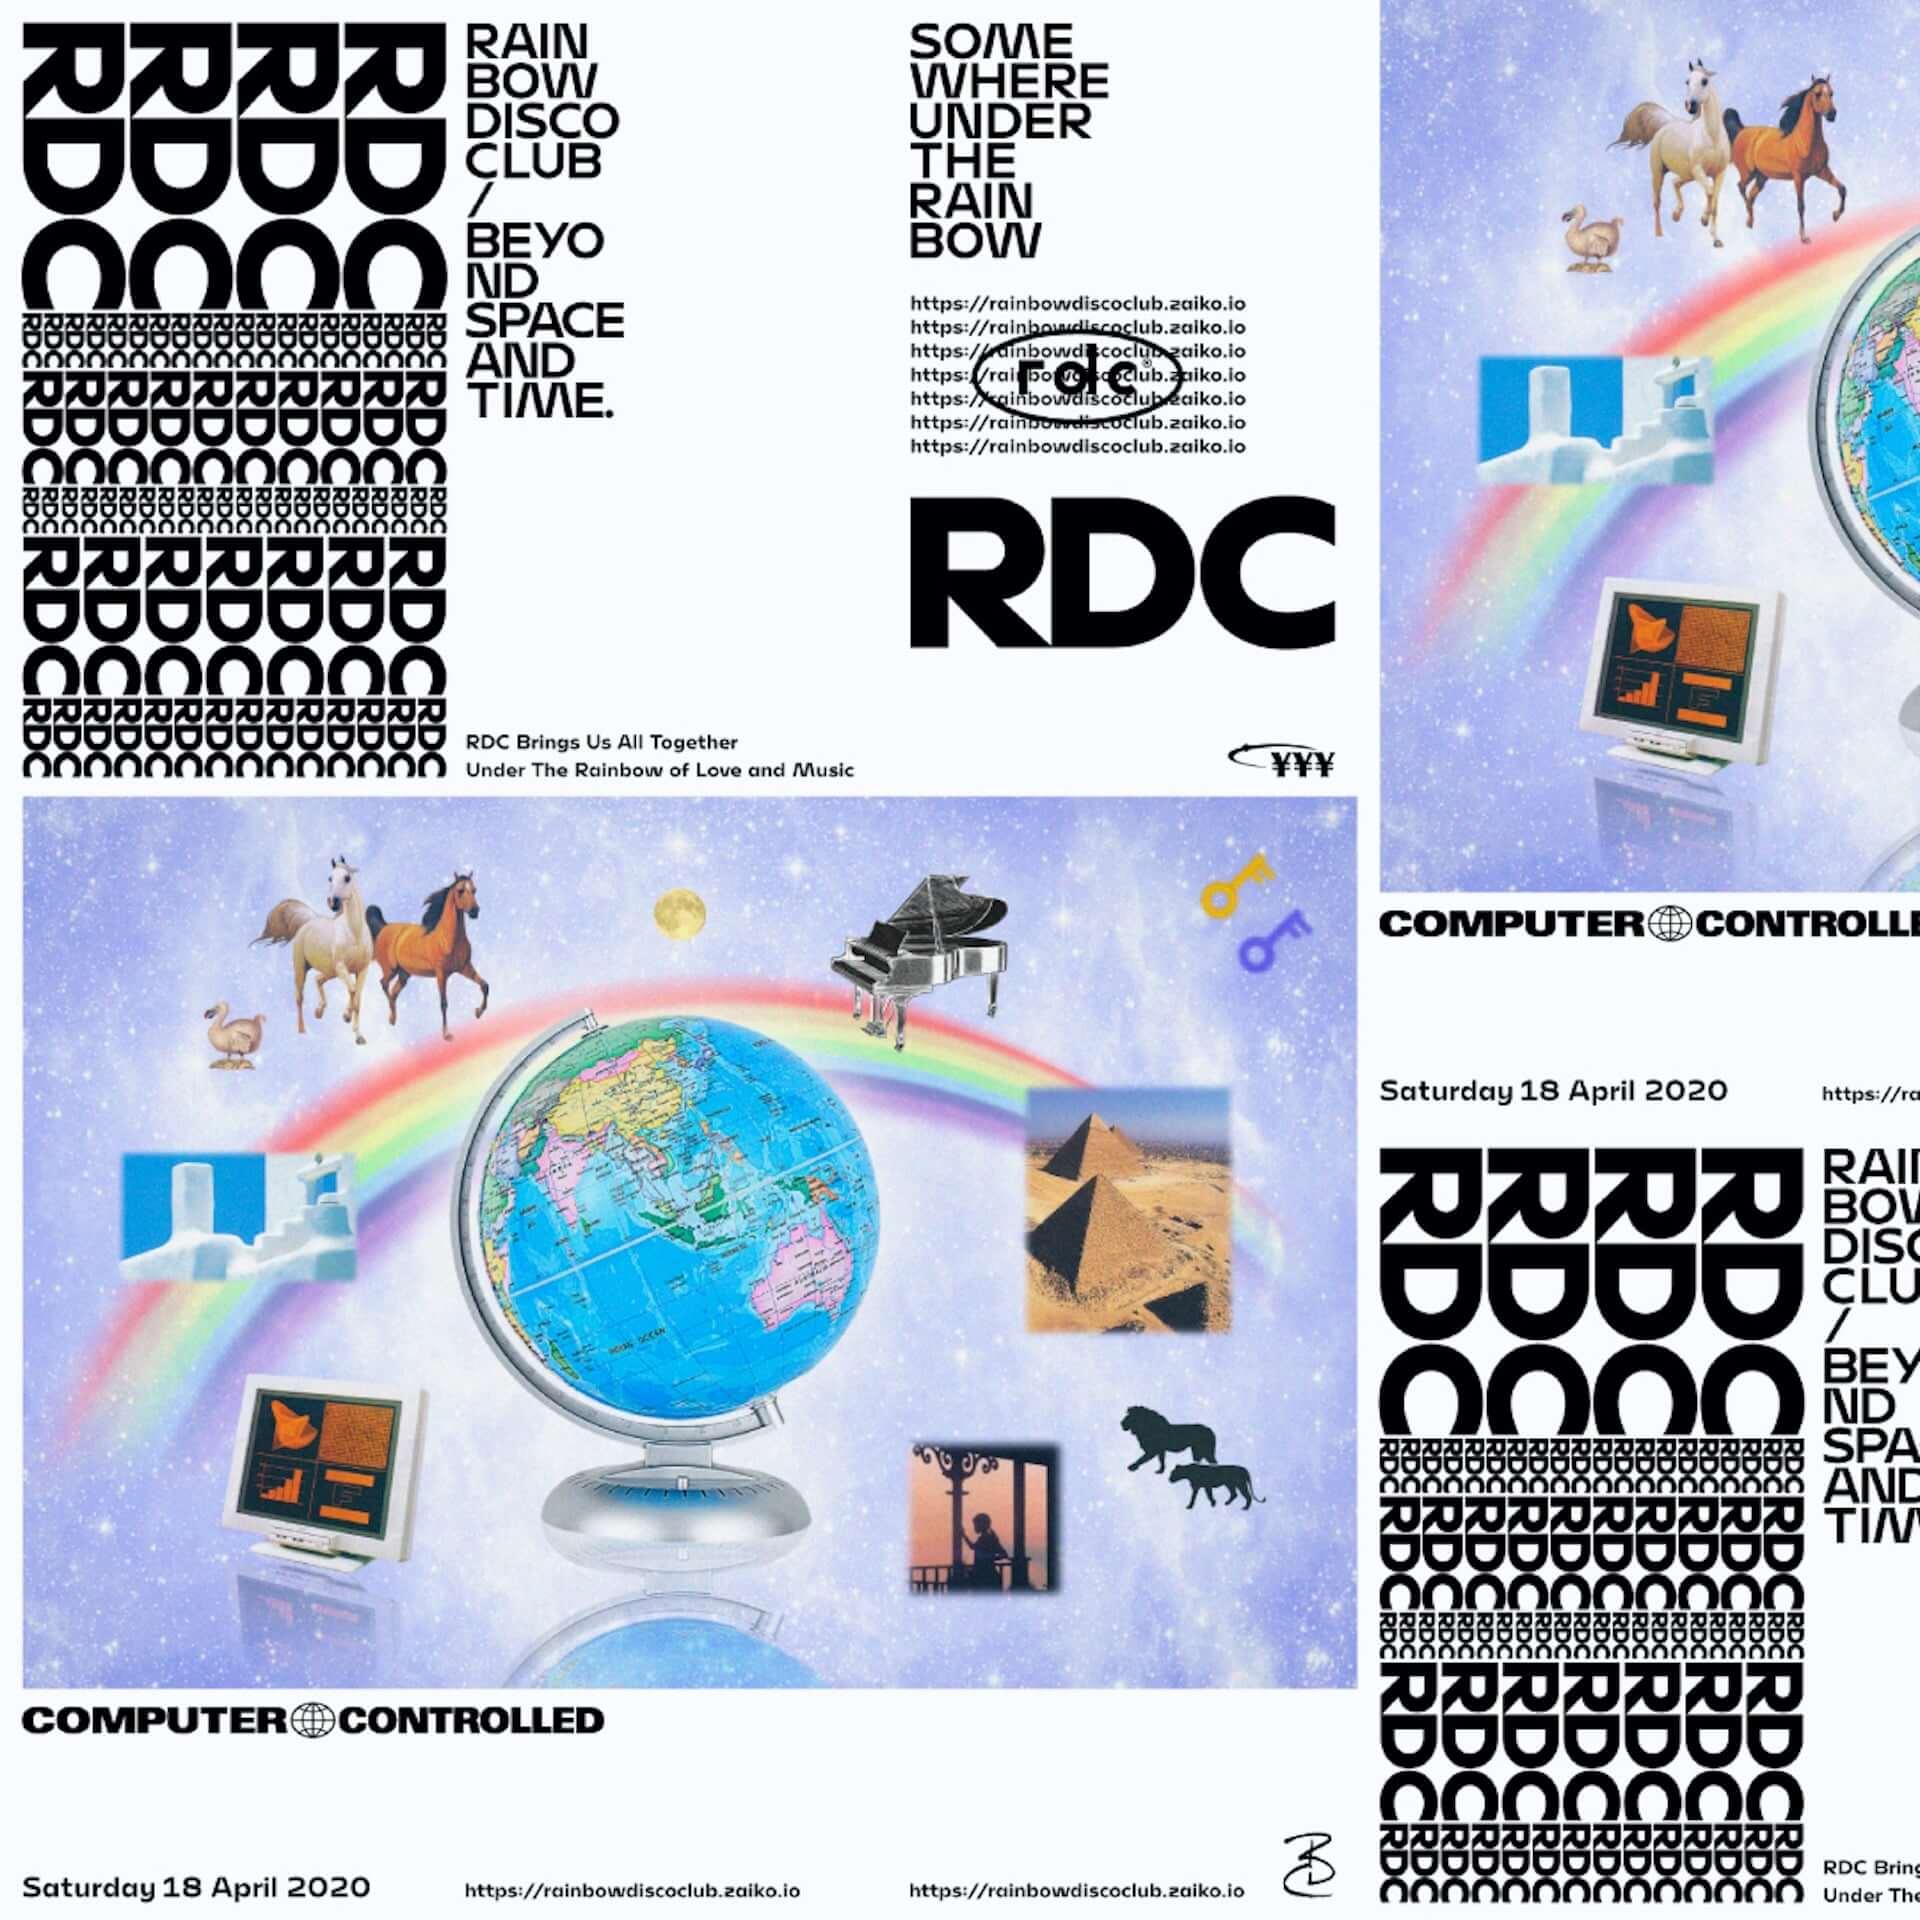 <RAINBOW DISCO CLUB>が12時間ノンストップ動画配信イベントを開催!DJ Nobu、Licaxxx、Yoshinori Hayashi、CYKらが出演 music200327_rainbow_disco_club_2-1920x1920